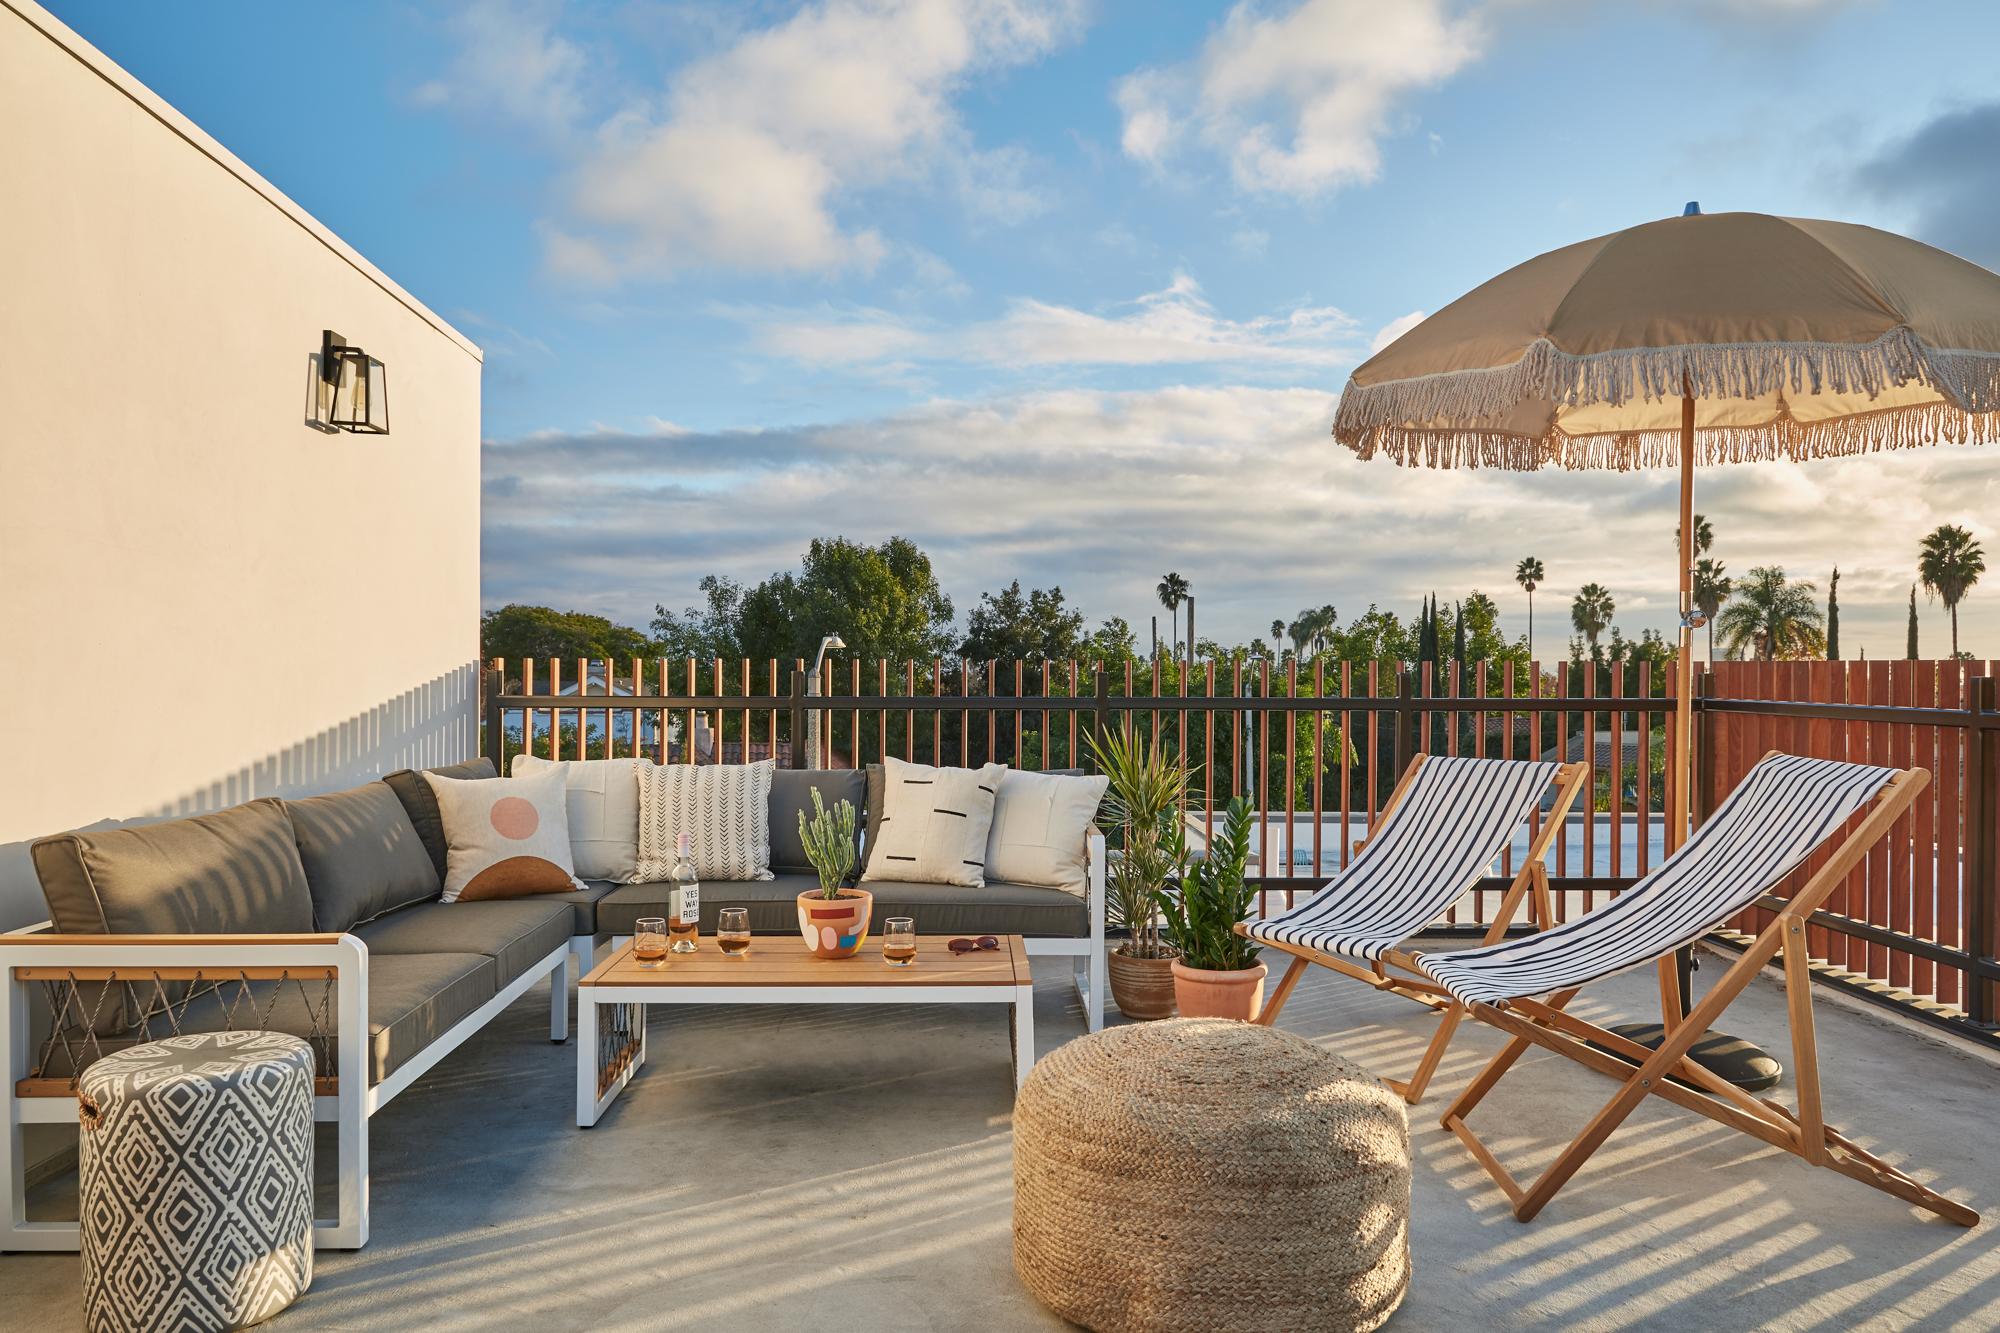 Rooftop Deck / 360 Views